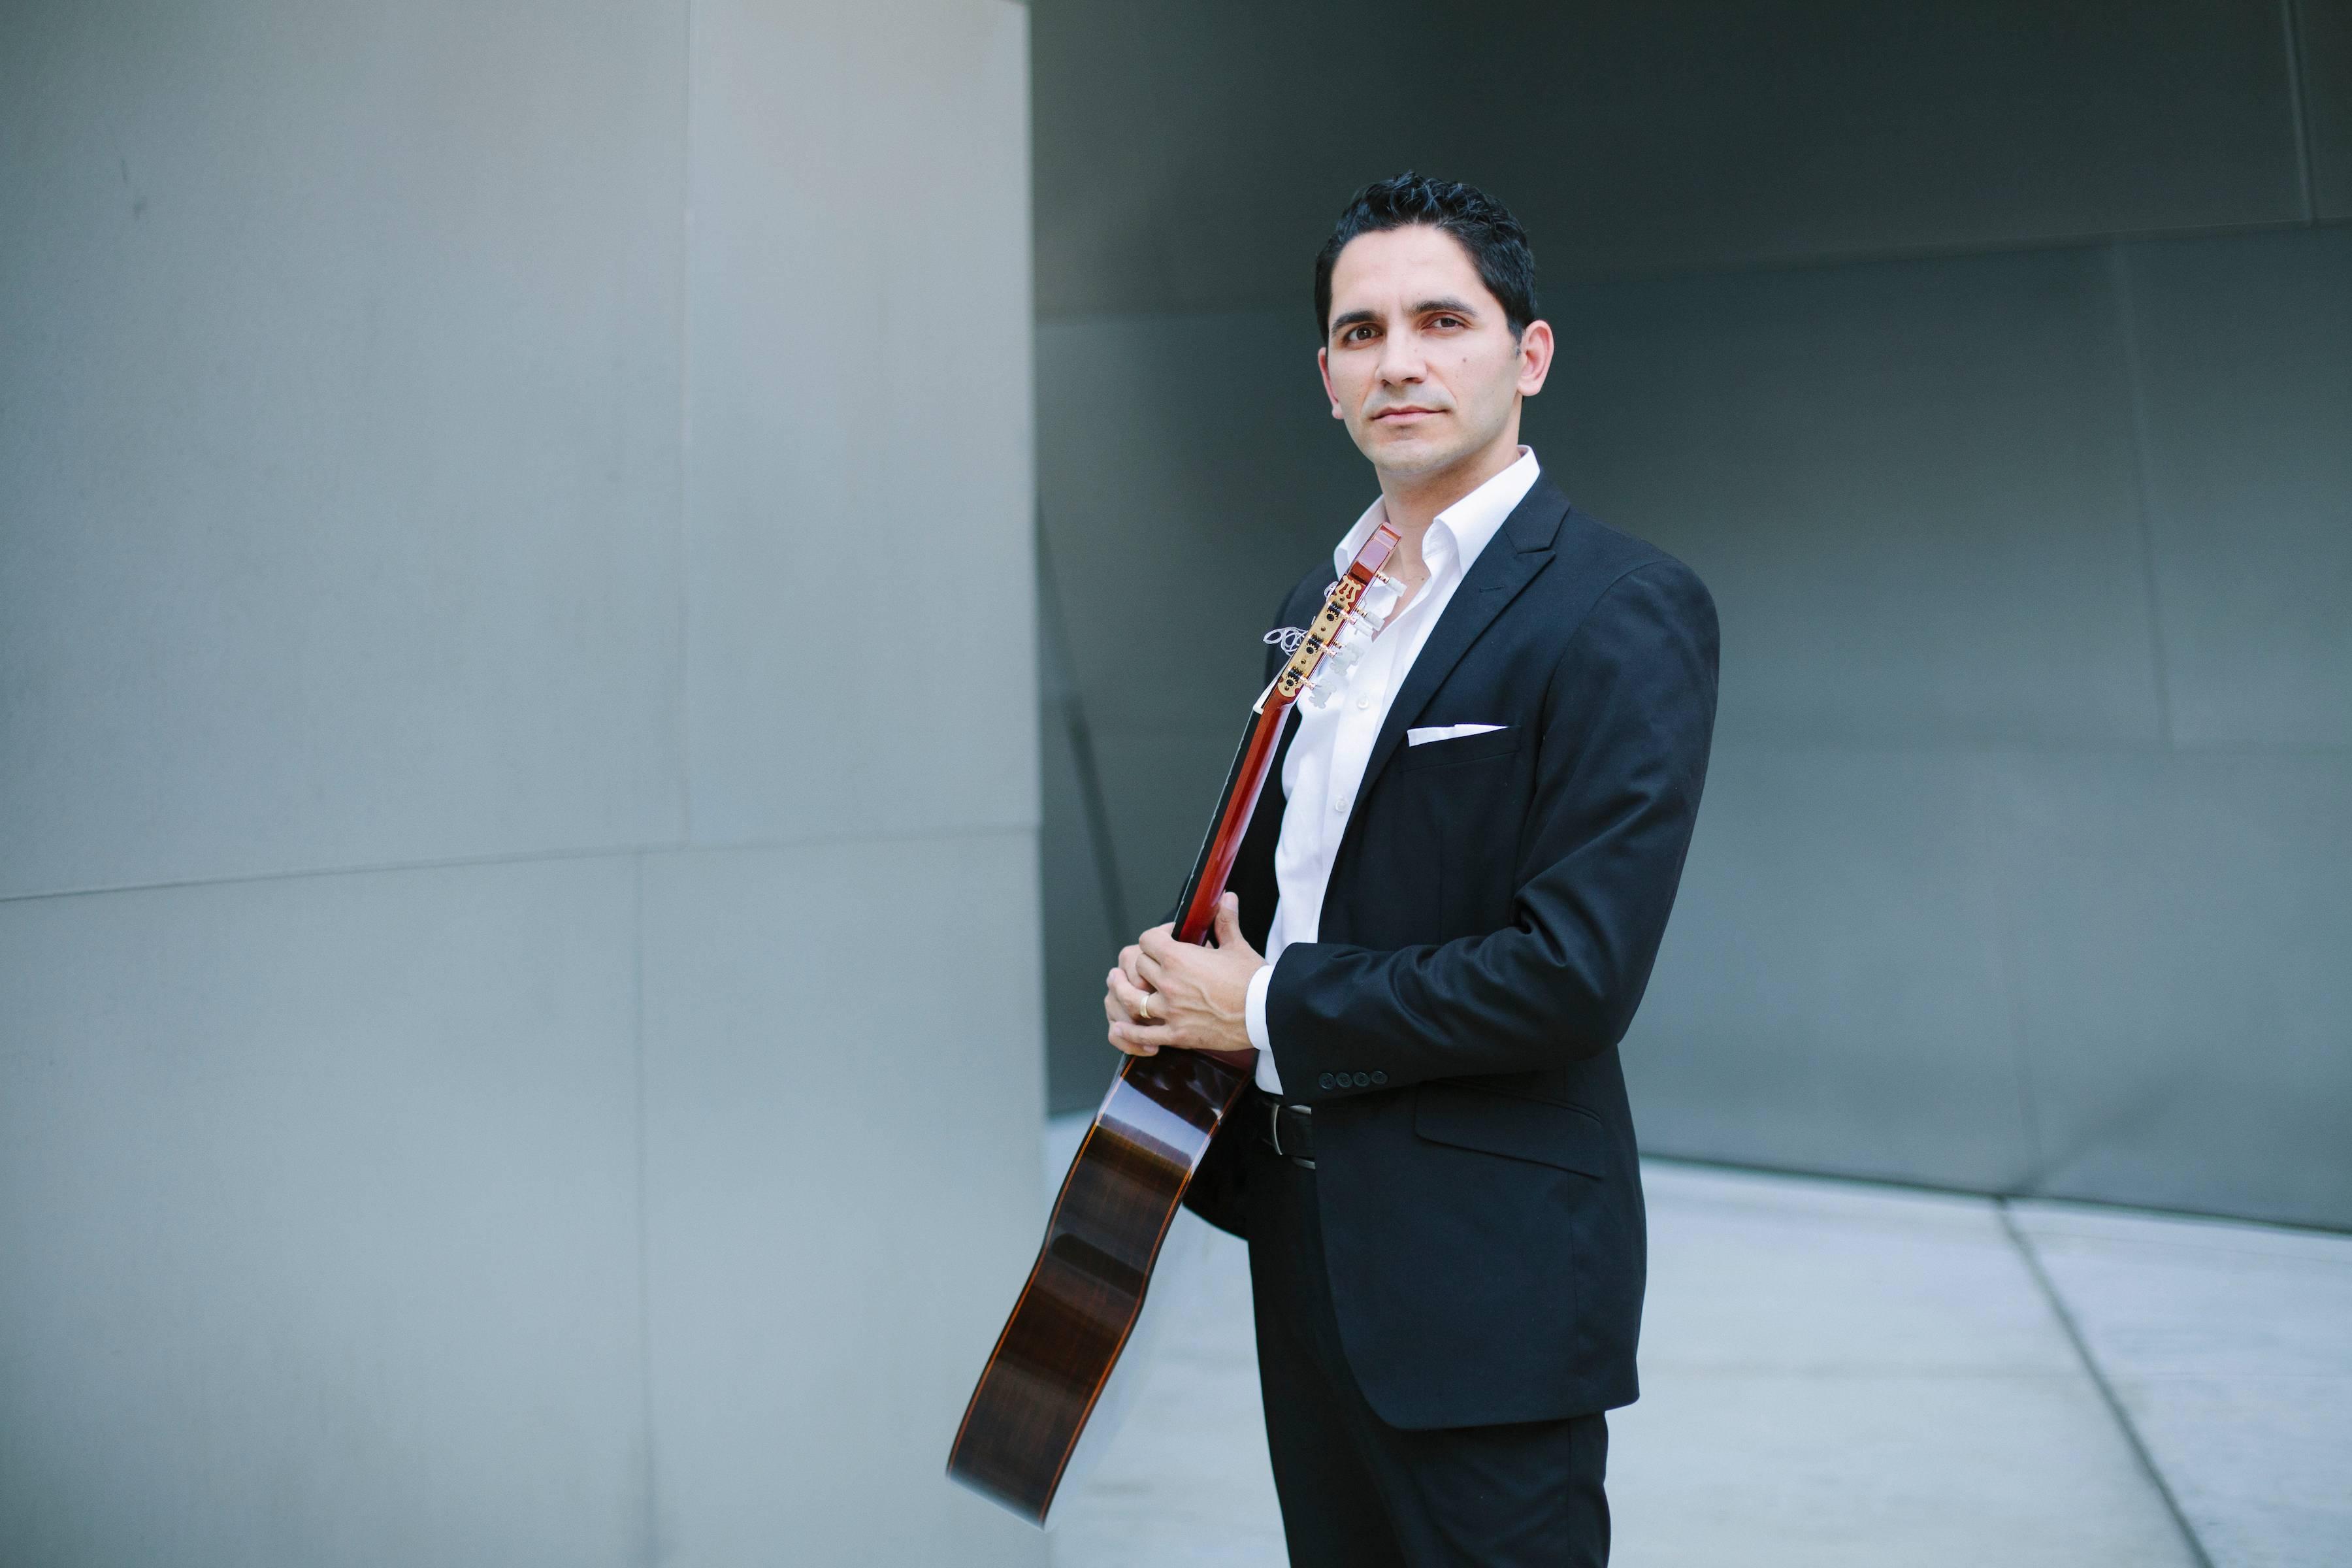 Tavi Jinariu Los Angeles Classical Guitarist